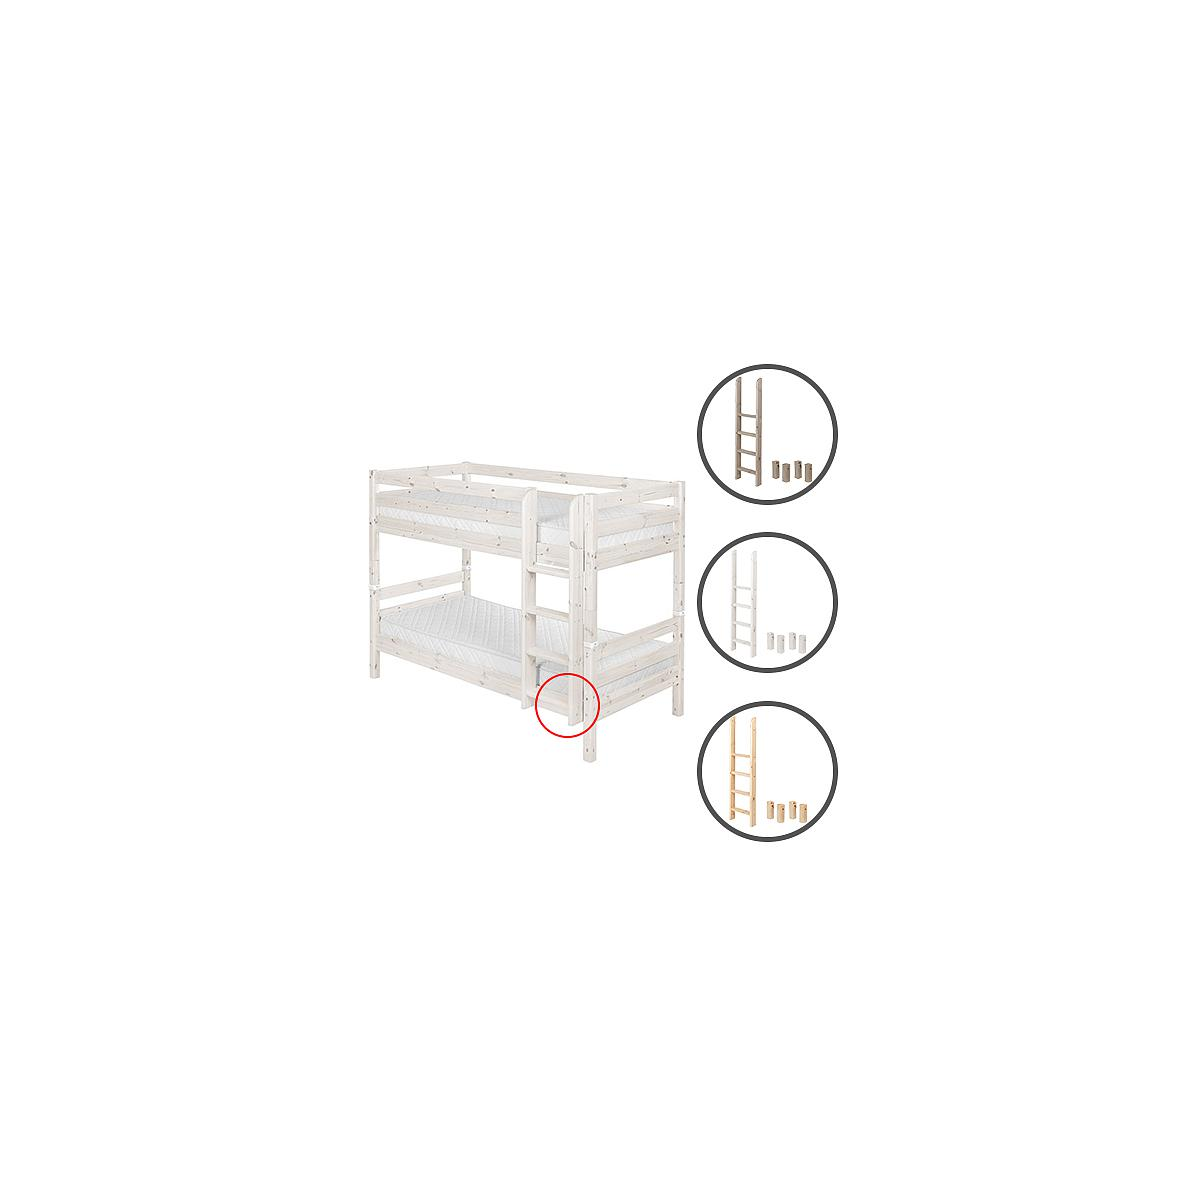 Escalera recta y patas Litera CLASSIC Flexa blanco cal